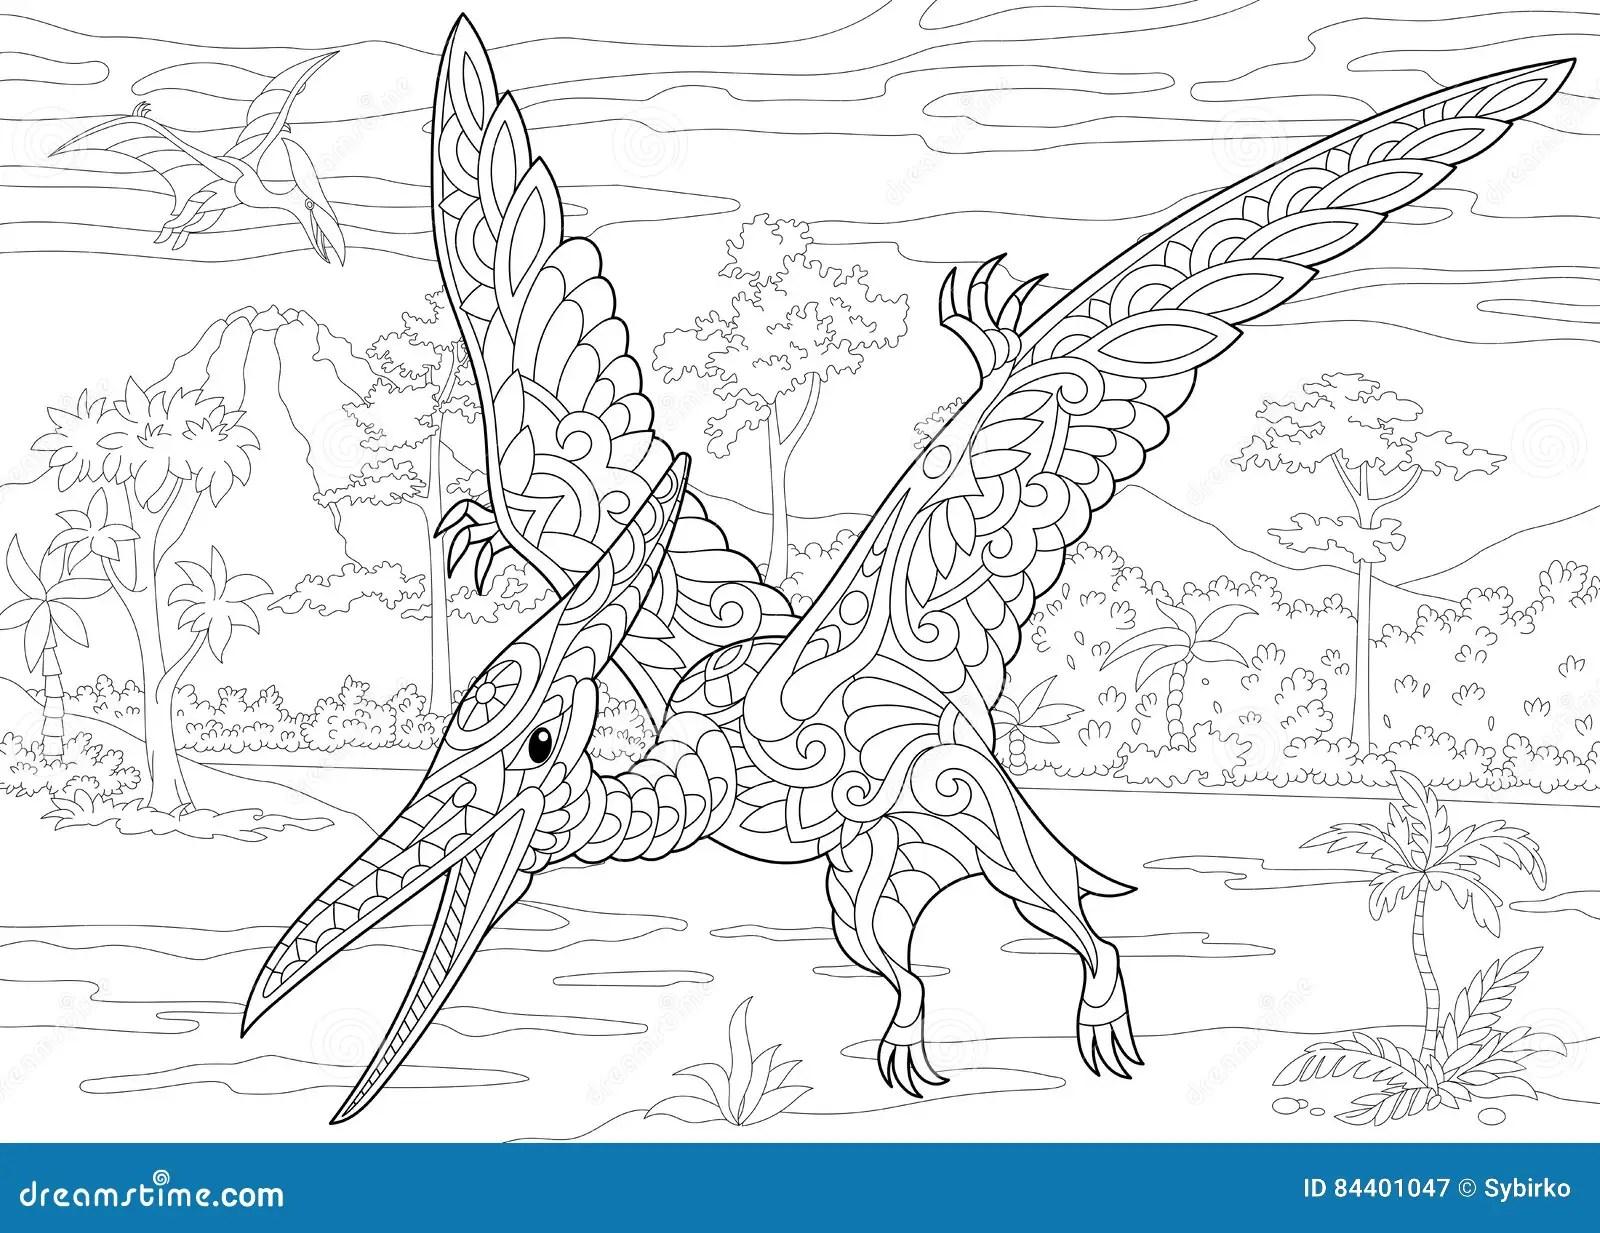 Pterodactyl Stock Illustrations 1 567 Pterodactyl Stock Illustrations Vectors Amp Clipart